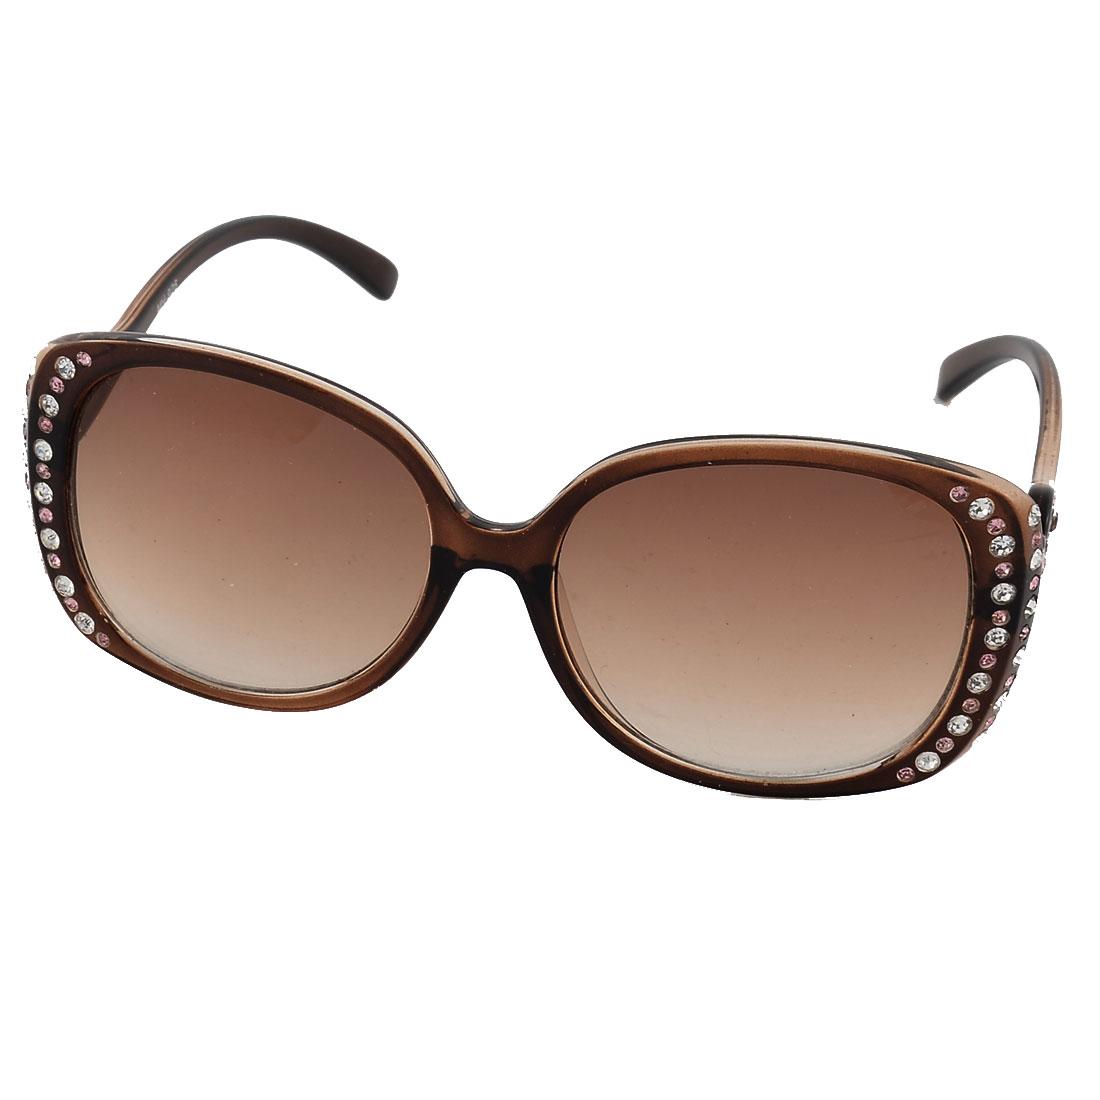 Rhinestone Inlaid Full Rim Single Bridge Lens Eye Protector Eyewear Sunglasses